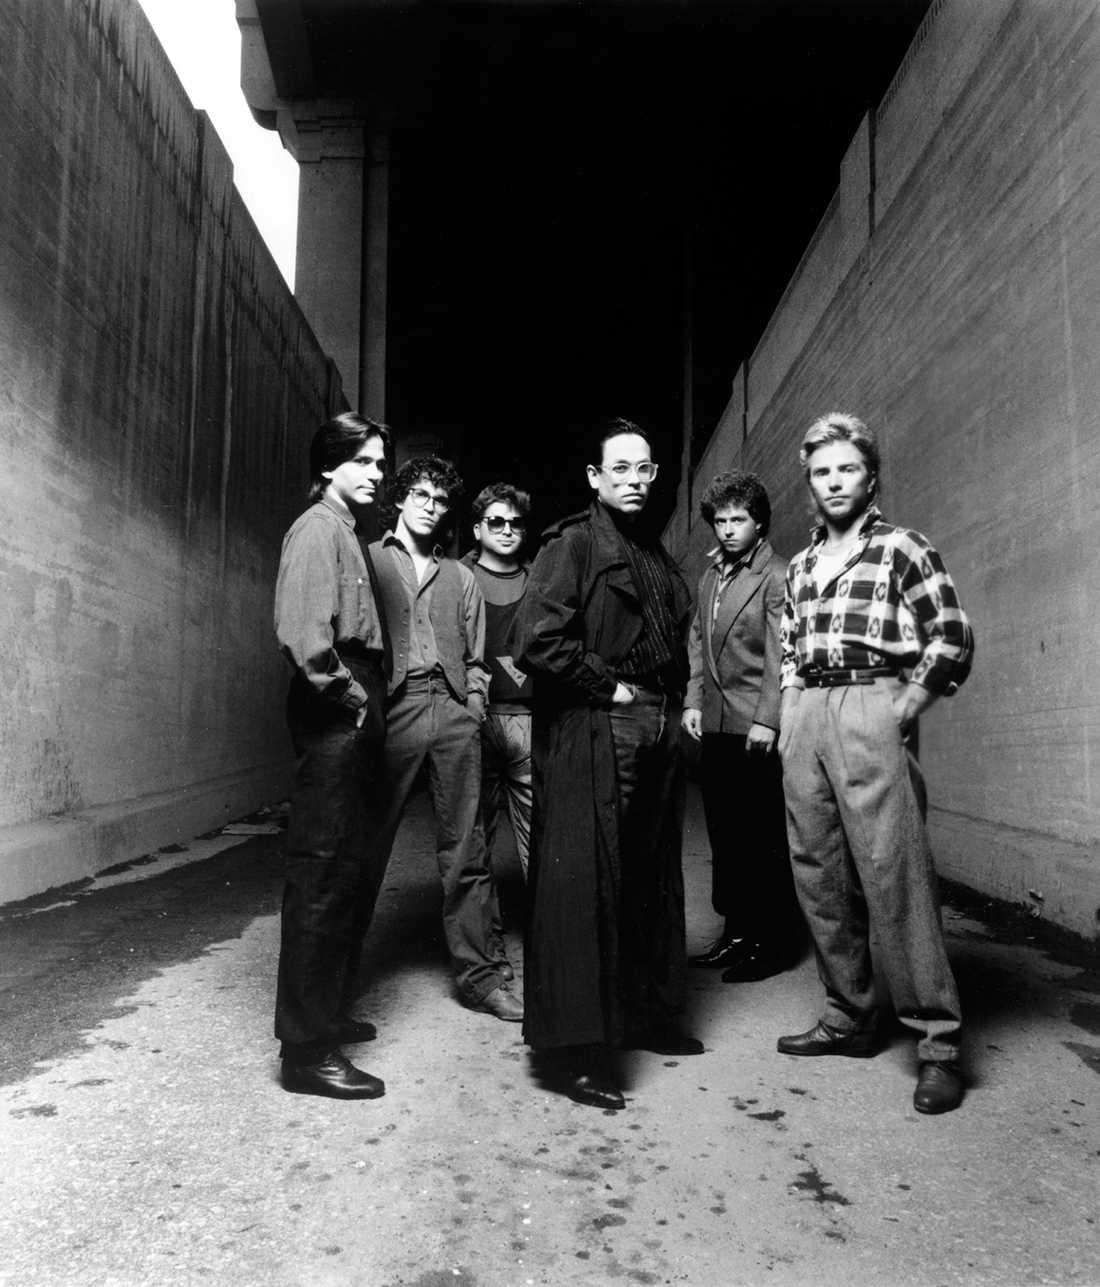 Michael Porcaro, Steve Porcaro, David Paich, Jeff Porcaro, Steve Lukather och Fergie Frederiksen i Los Angeles 1984.